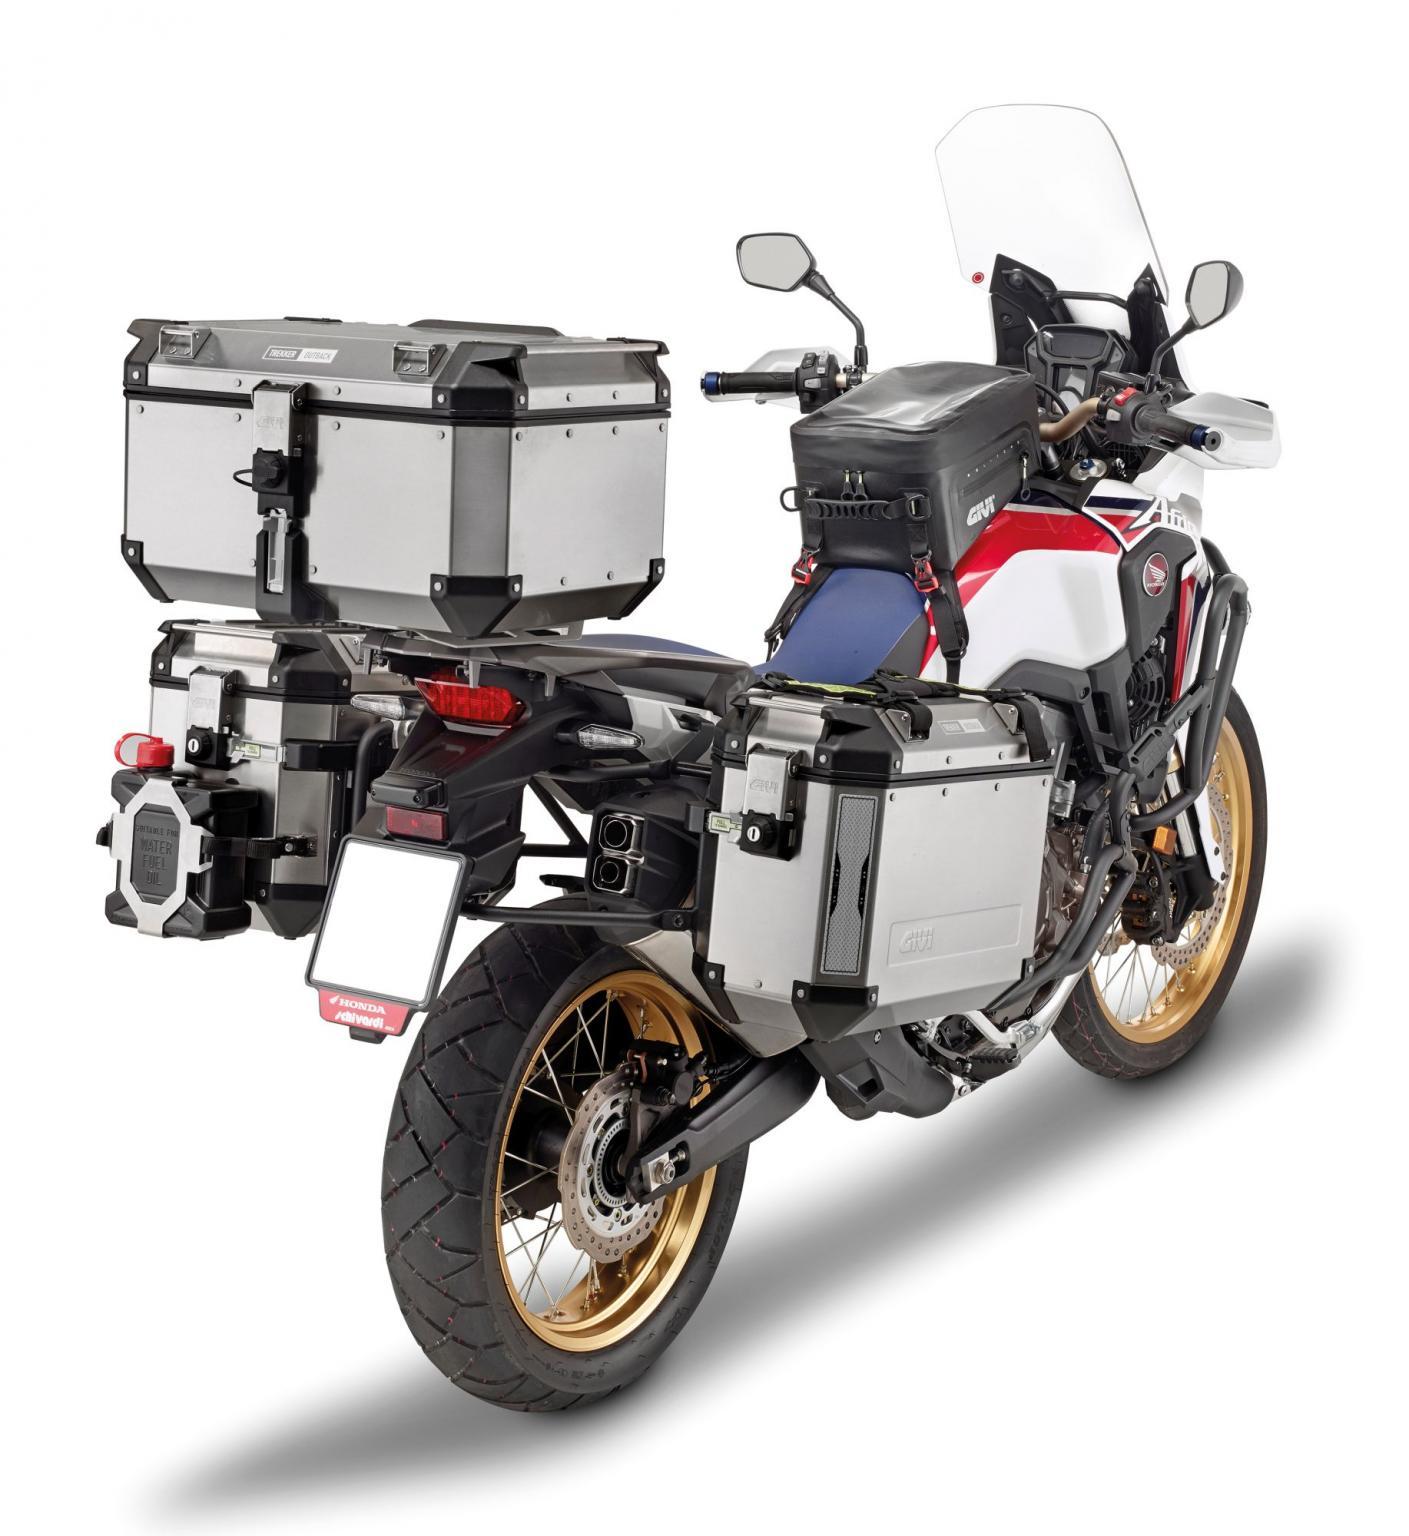 givi zubeh r f r honda africa twin 2016 motorrad fotos. Black Bedroom Furniture Sets. Home Design Ideas